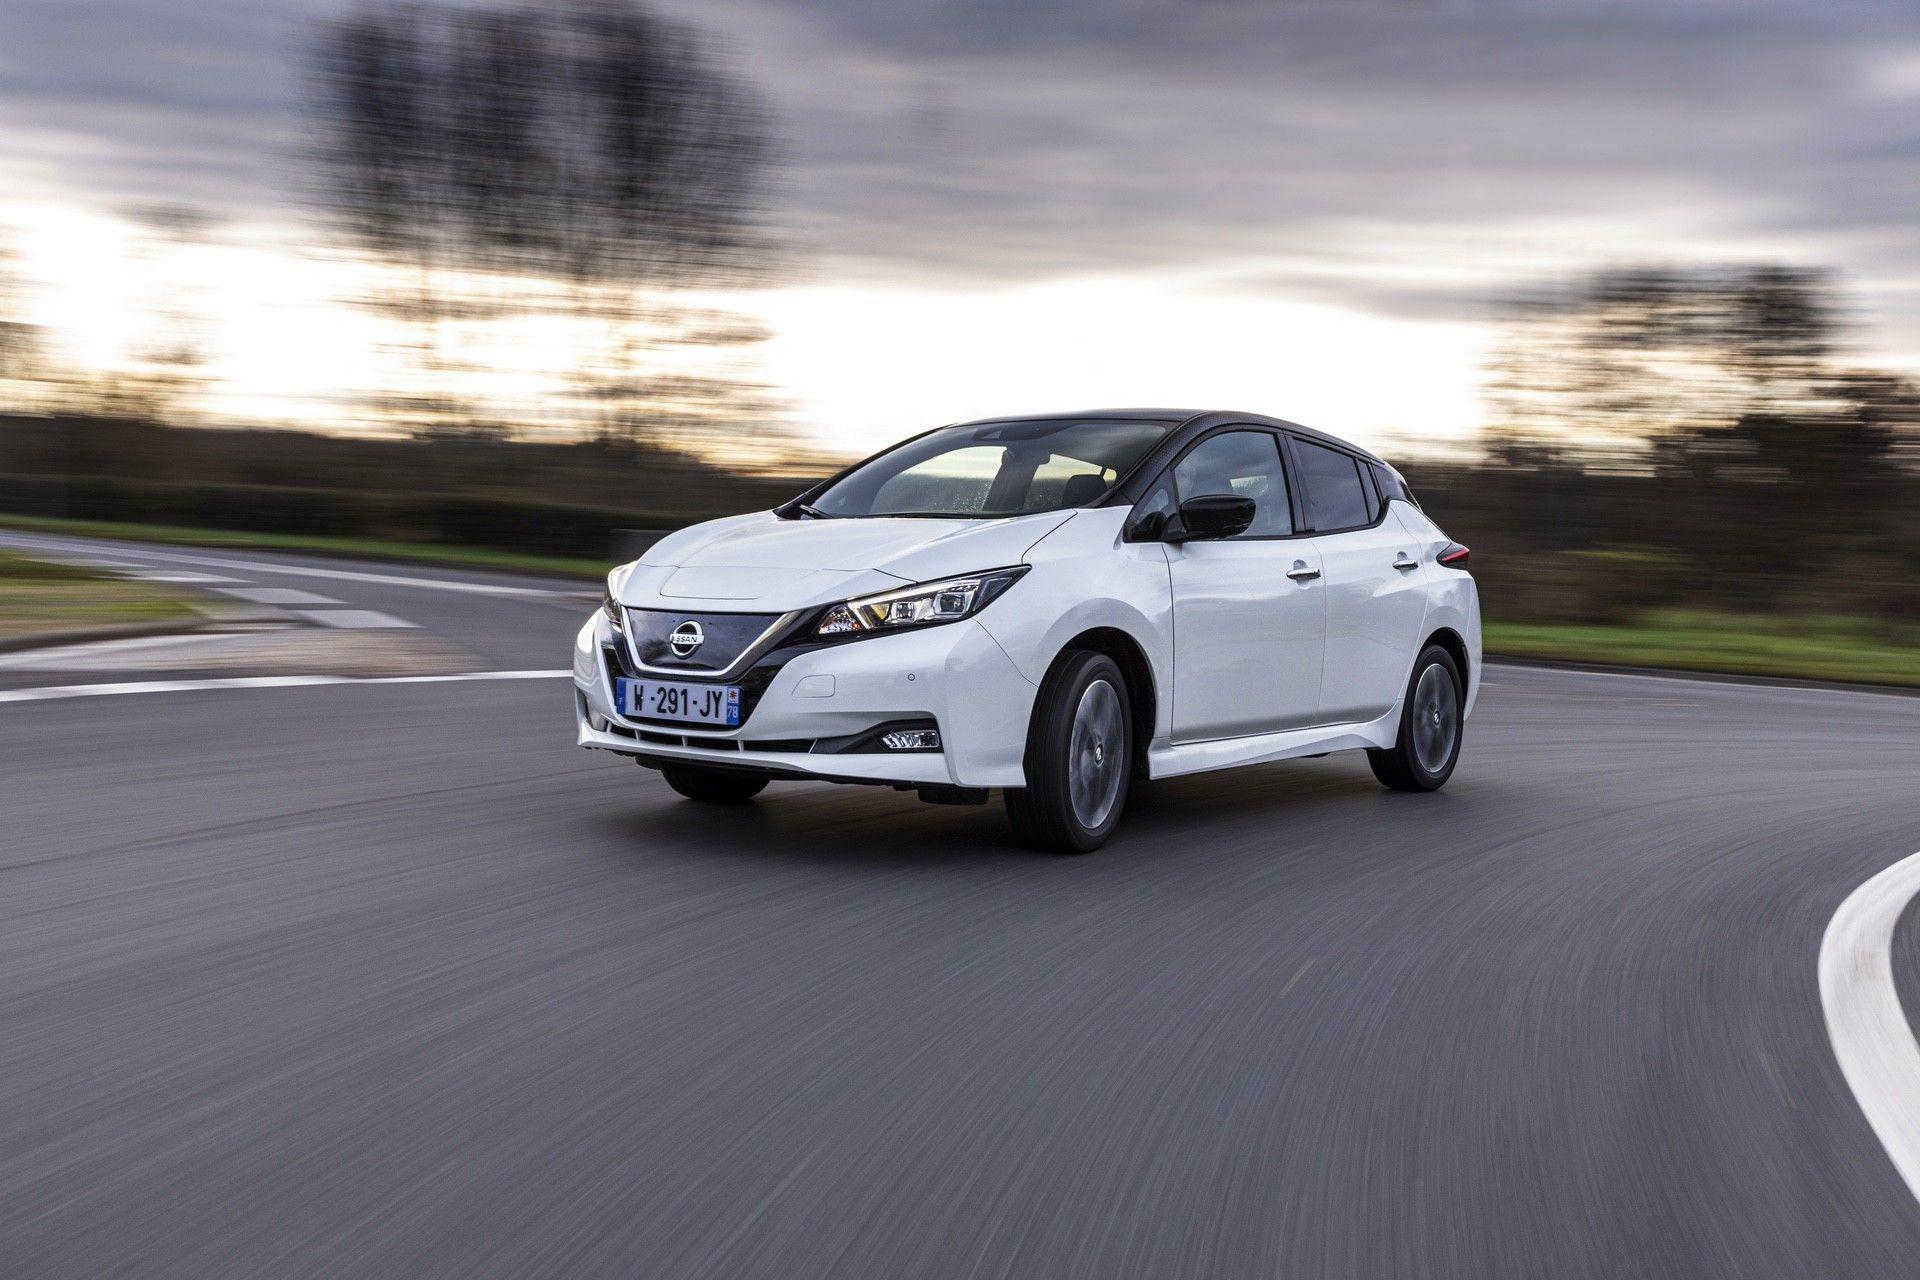 Nissan_Leaf10_special_edition-0016